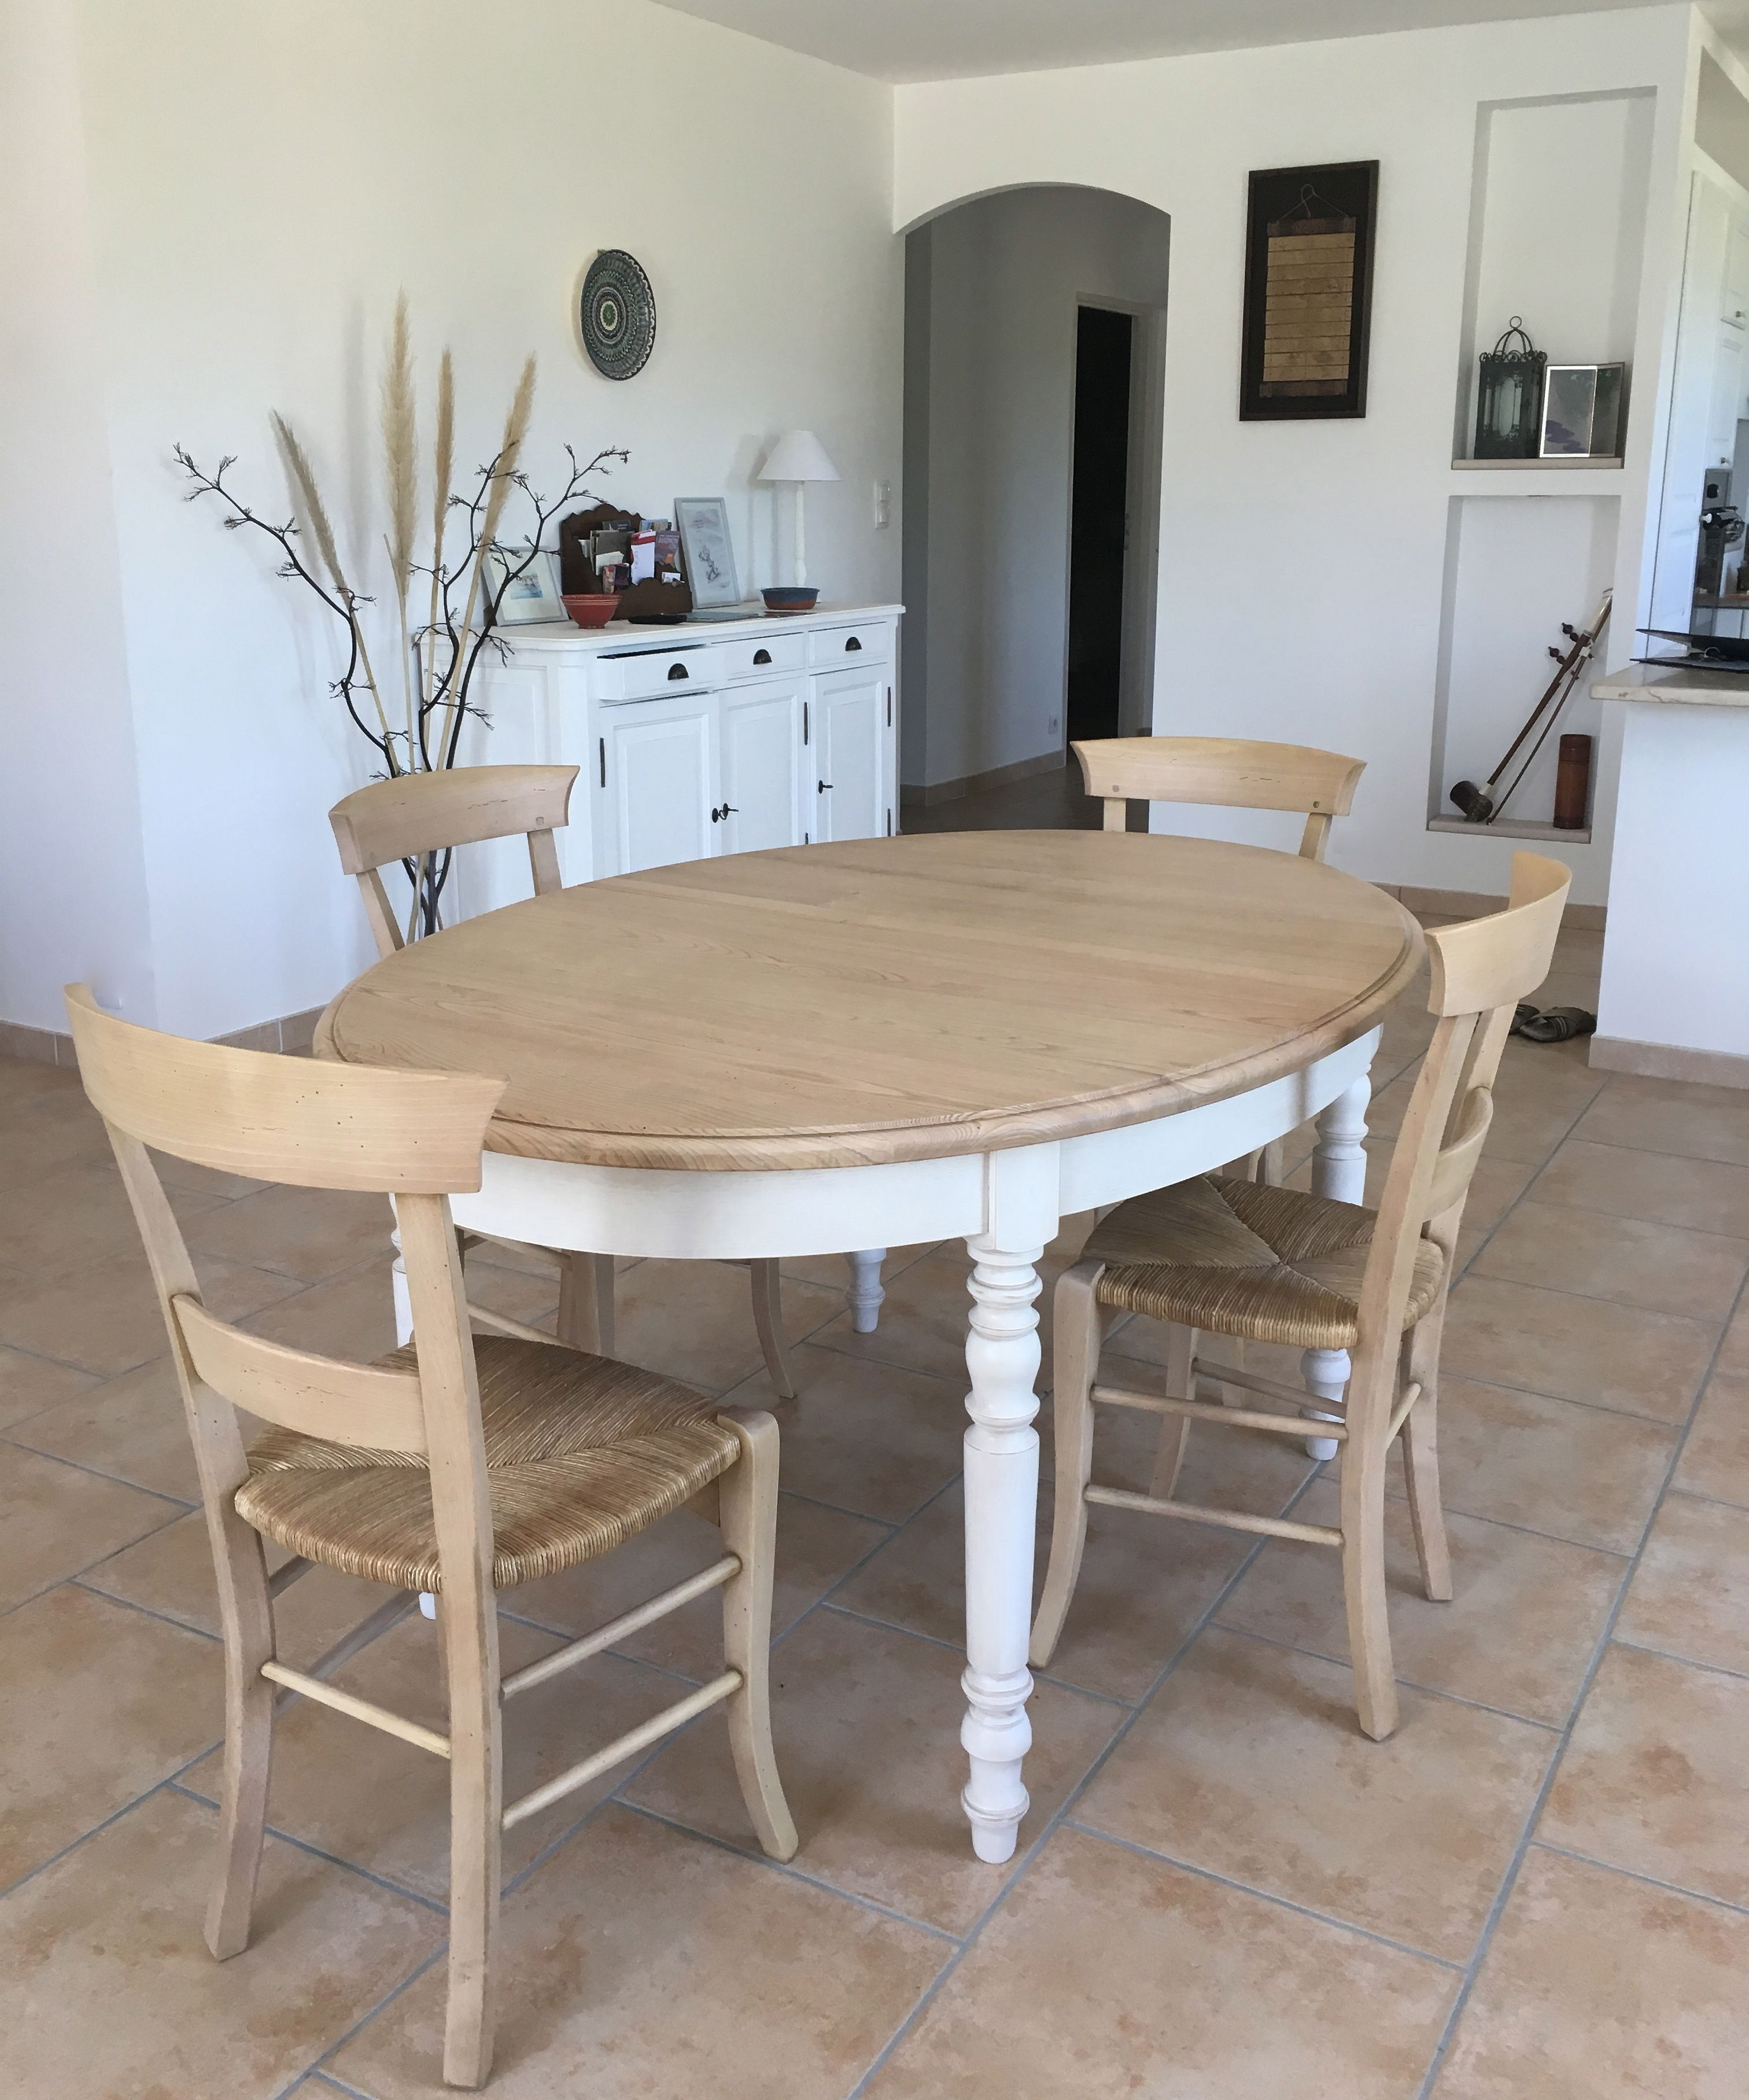 Table Salle Manger Ovale Bois Naturel Massif Et Blanc Ambiance